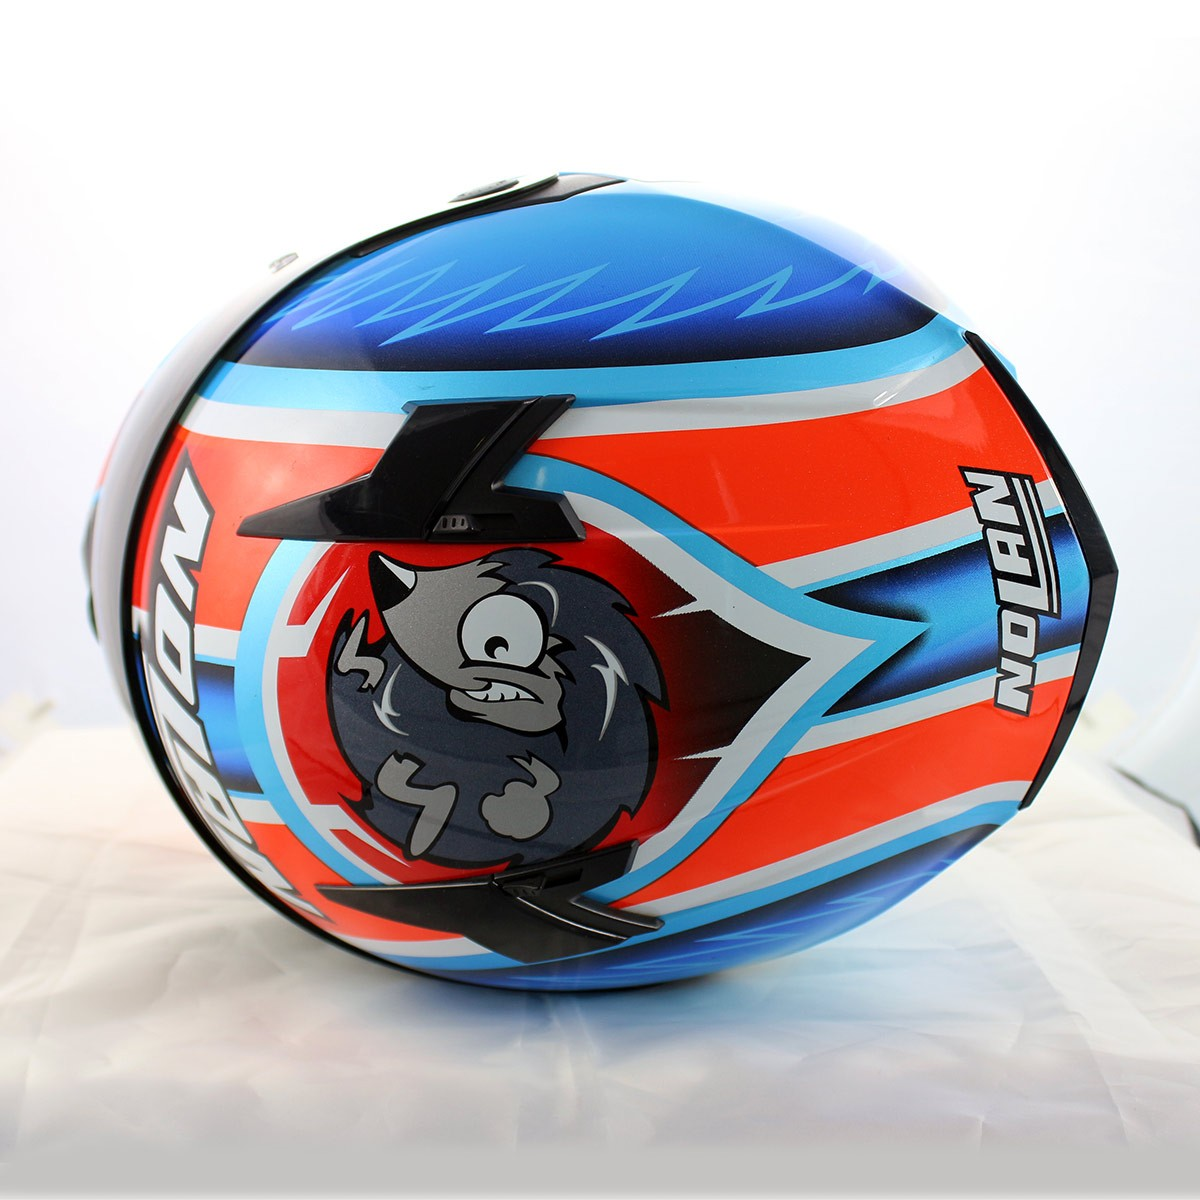 Capacete Nolan N64 Réplica Melandri Pearl Blue   - Planet Bike Shop Moto Acessórios